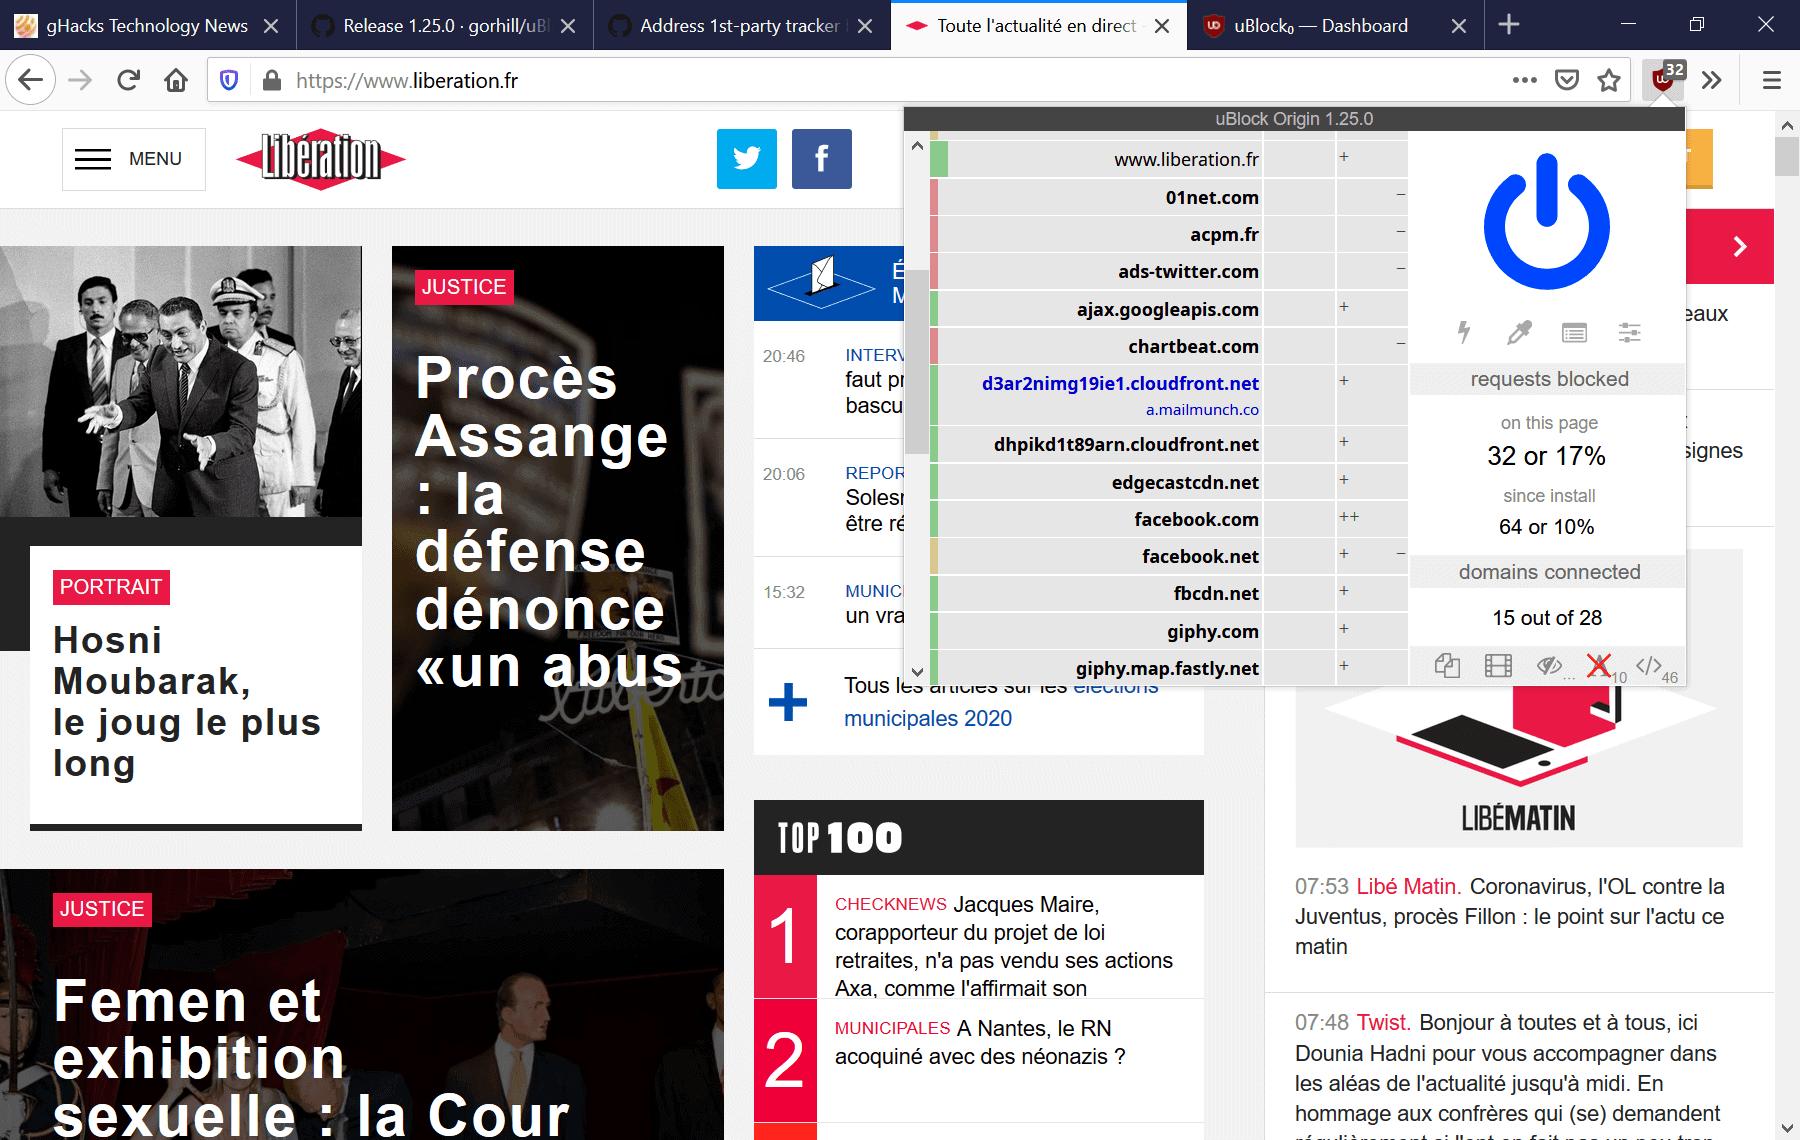 ublock origin firefox first-party blocking